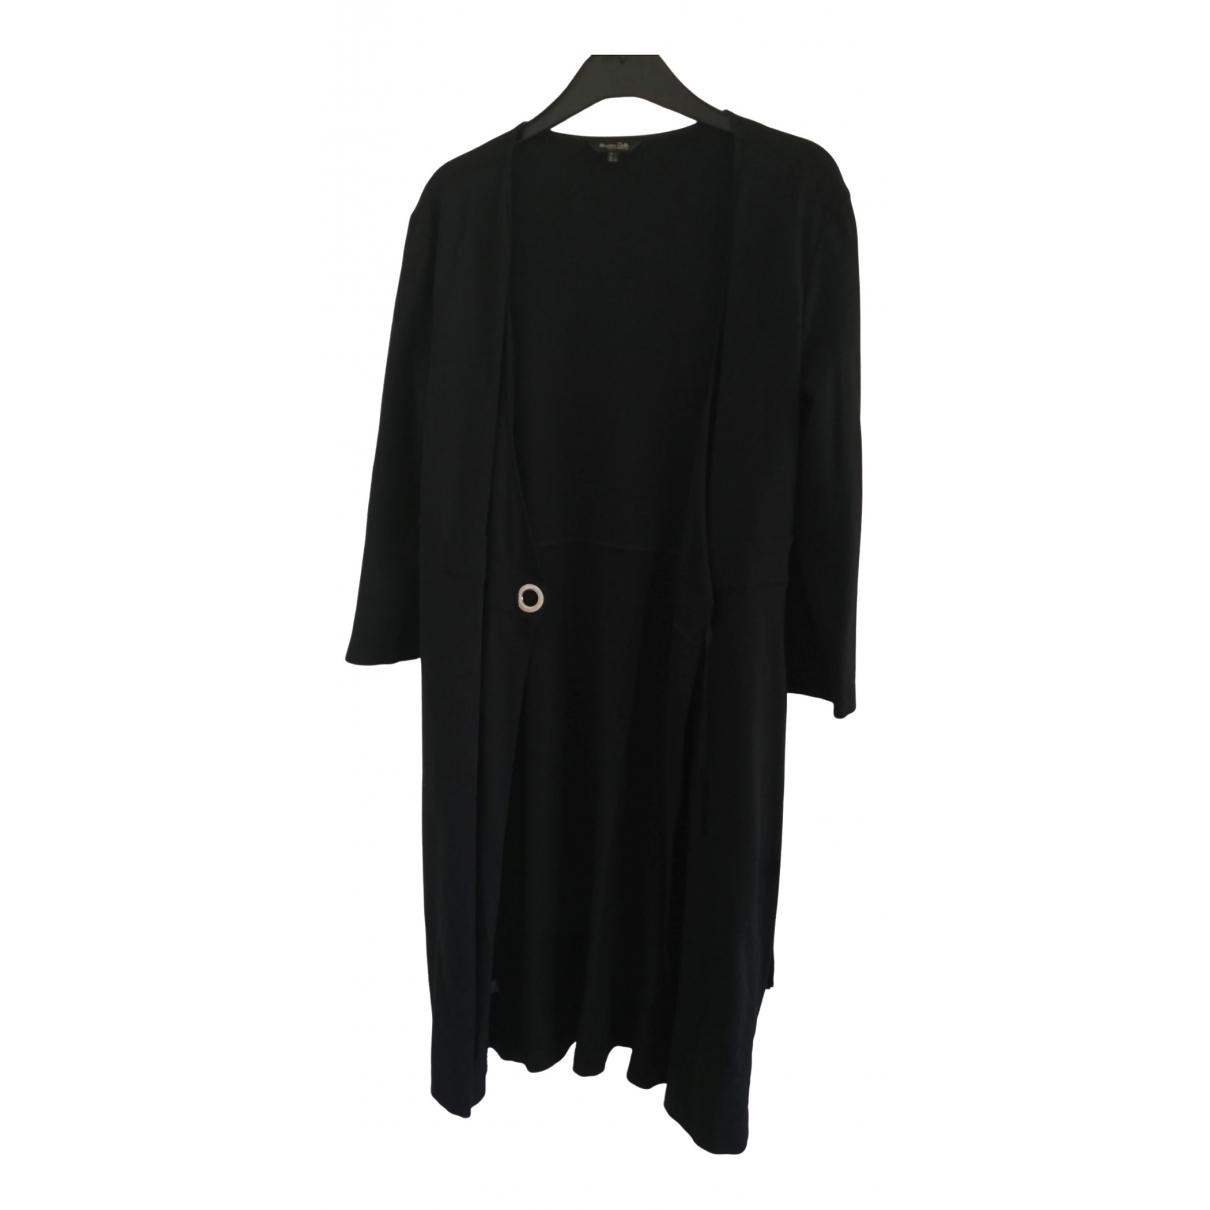 Massimo Dutti \N Kleid in  Schwarz Baumwolle - Elasthan